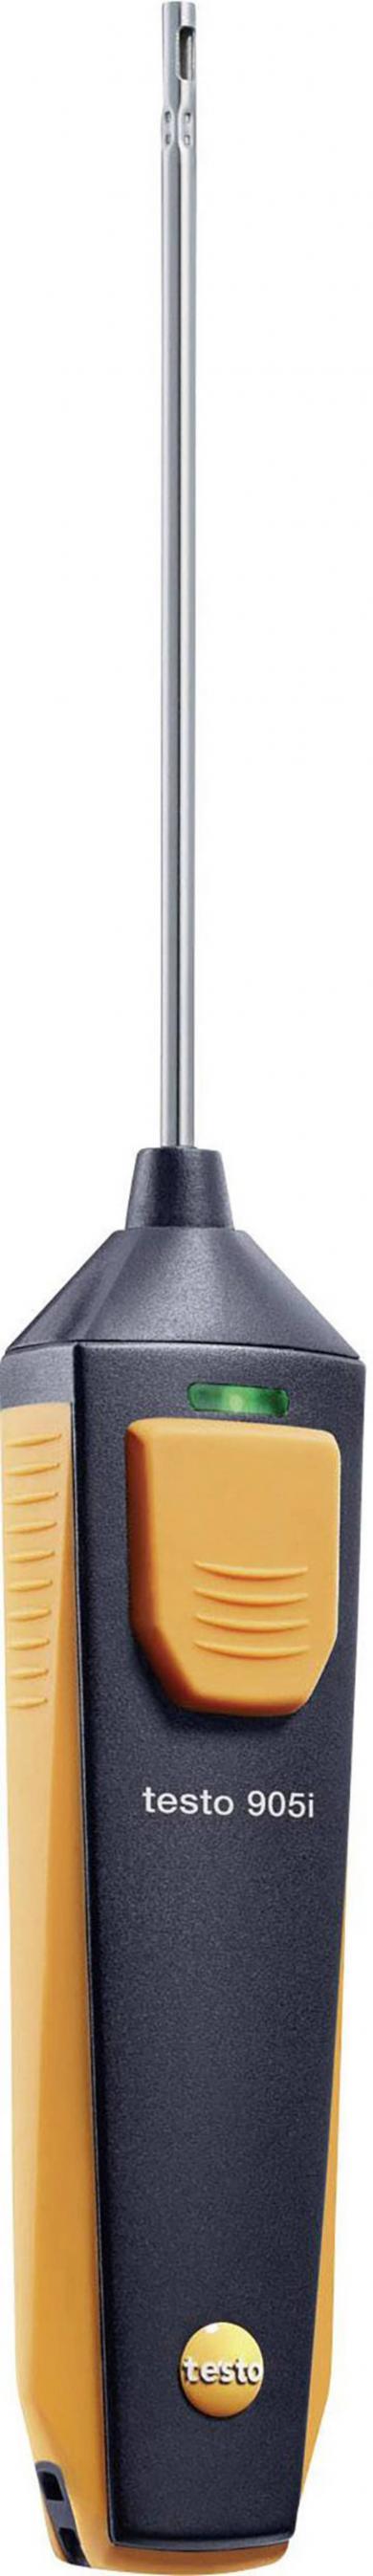 Termometru cu Bluetooth, testo 905i